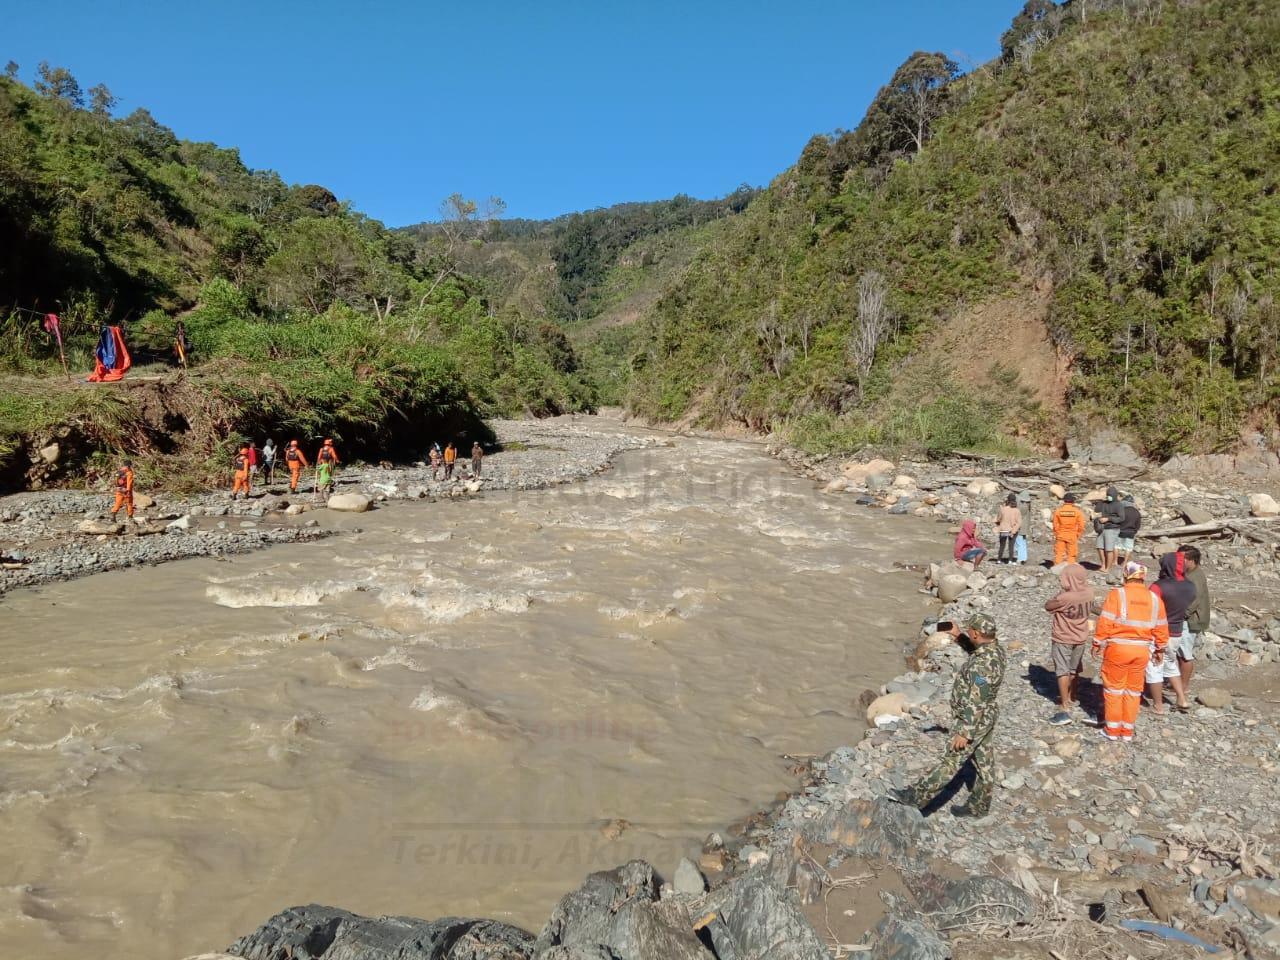 Basarnas Cari Warga Manokwari Terseret Arus di Sungai Didohu 10 IMG 20210315 WA0021